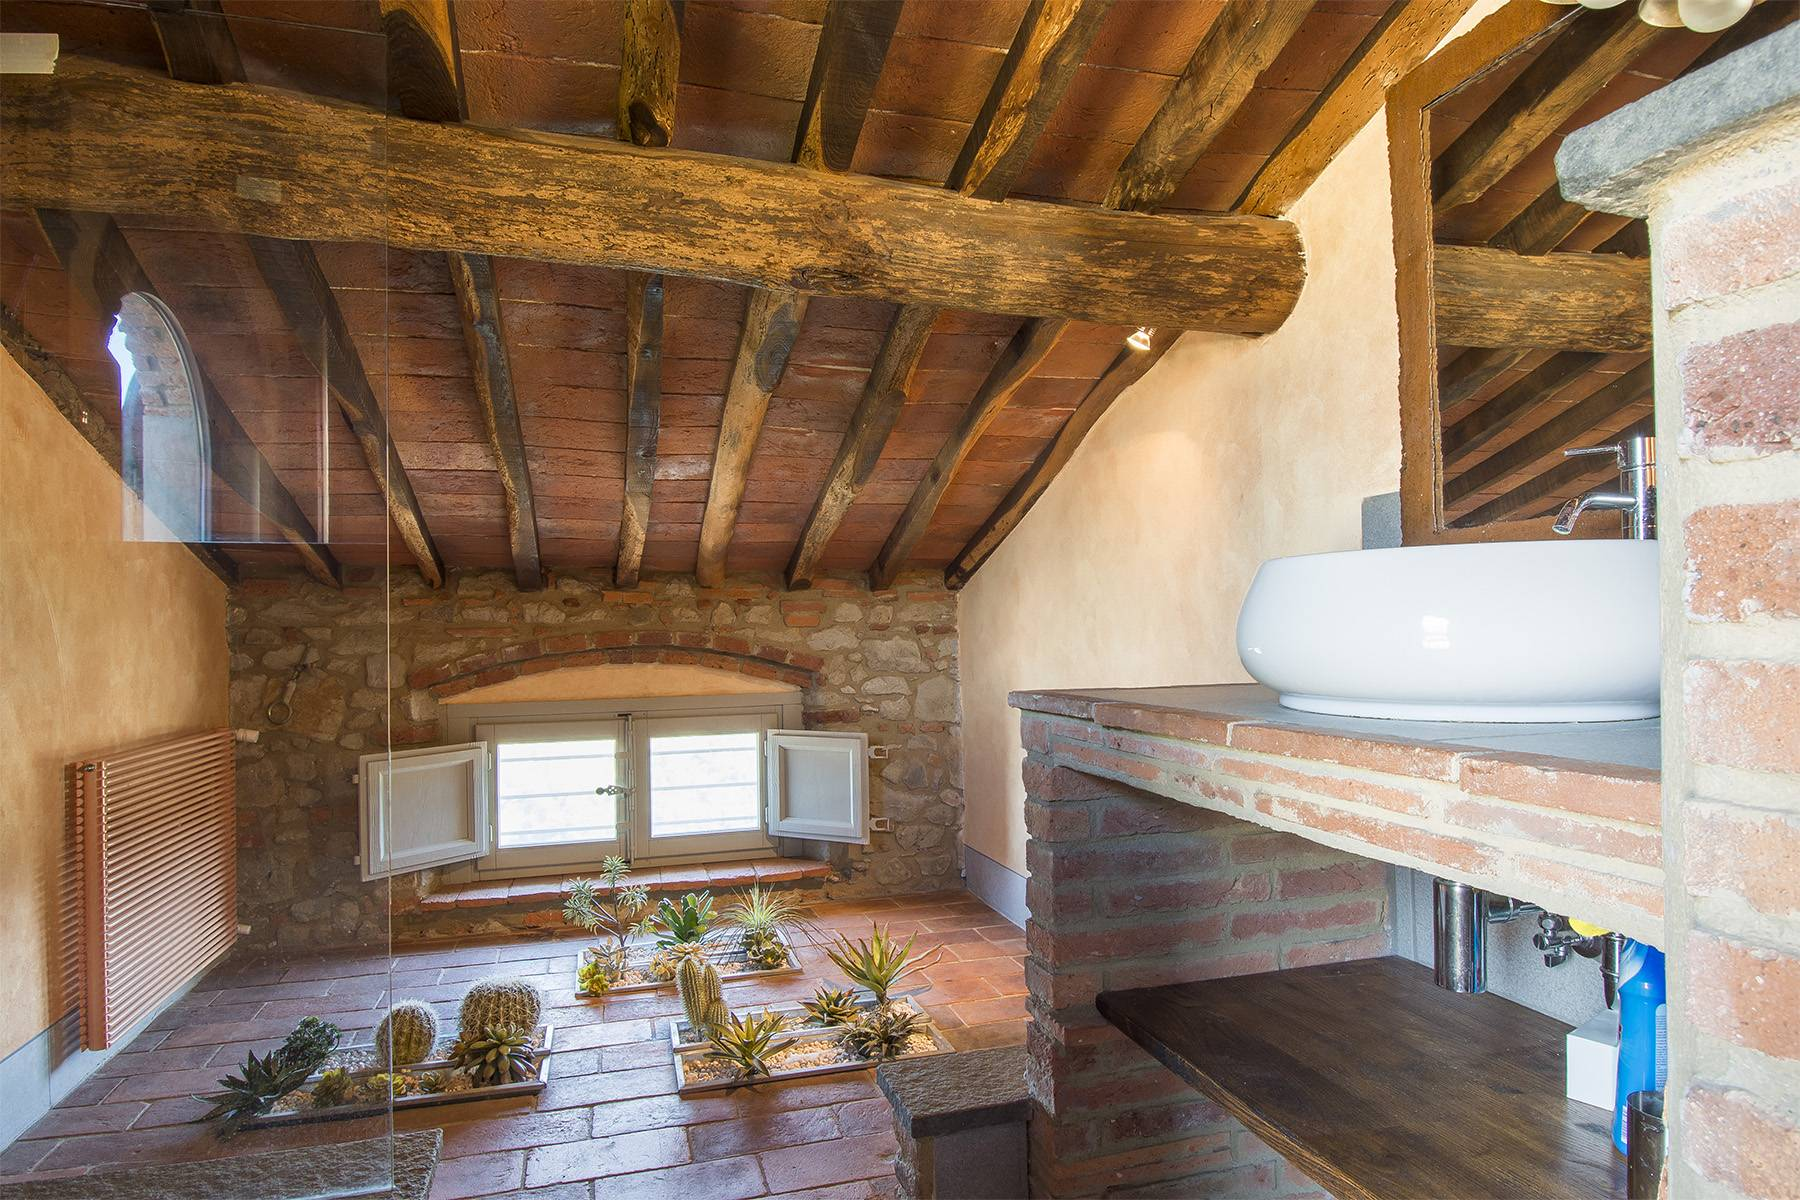 Rustico in Vendita a Lucca: 5 locali, 430 mq - Foto 10